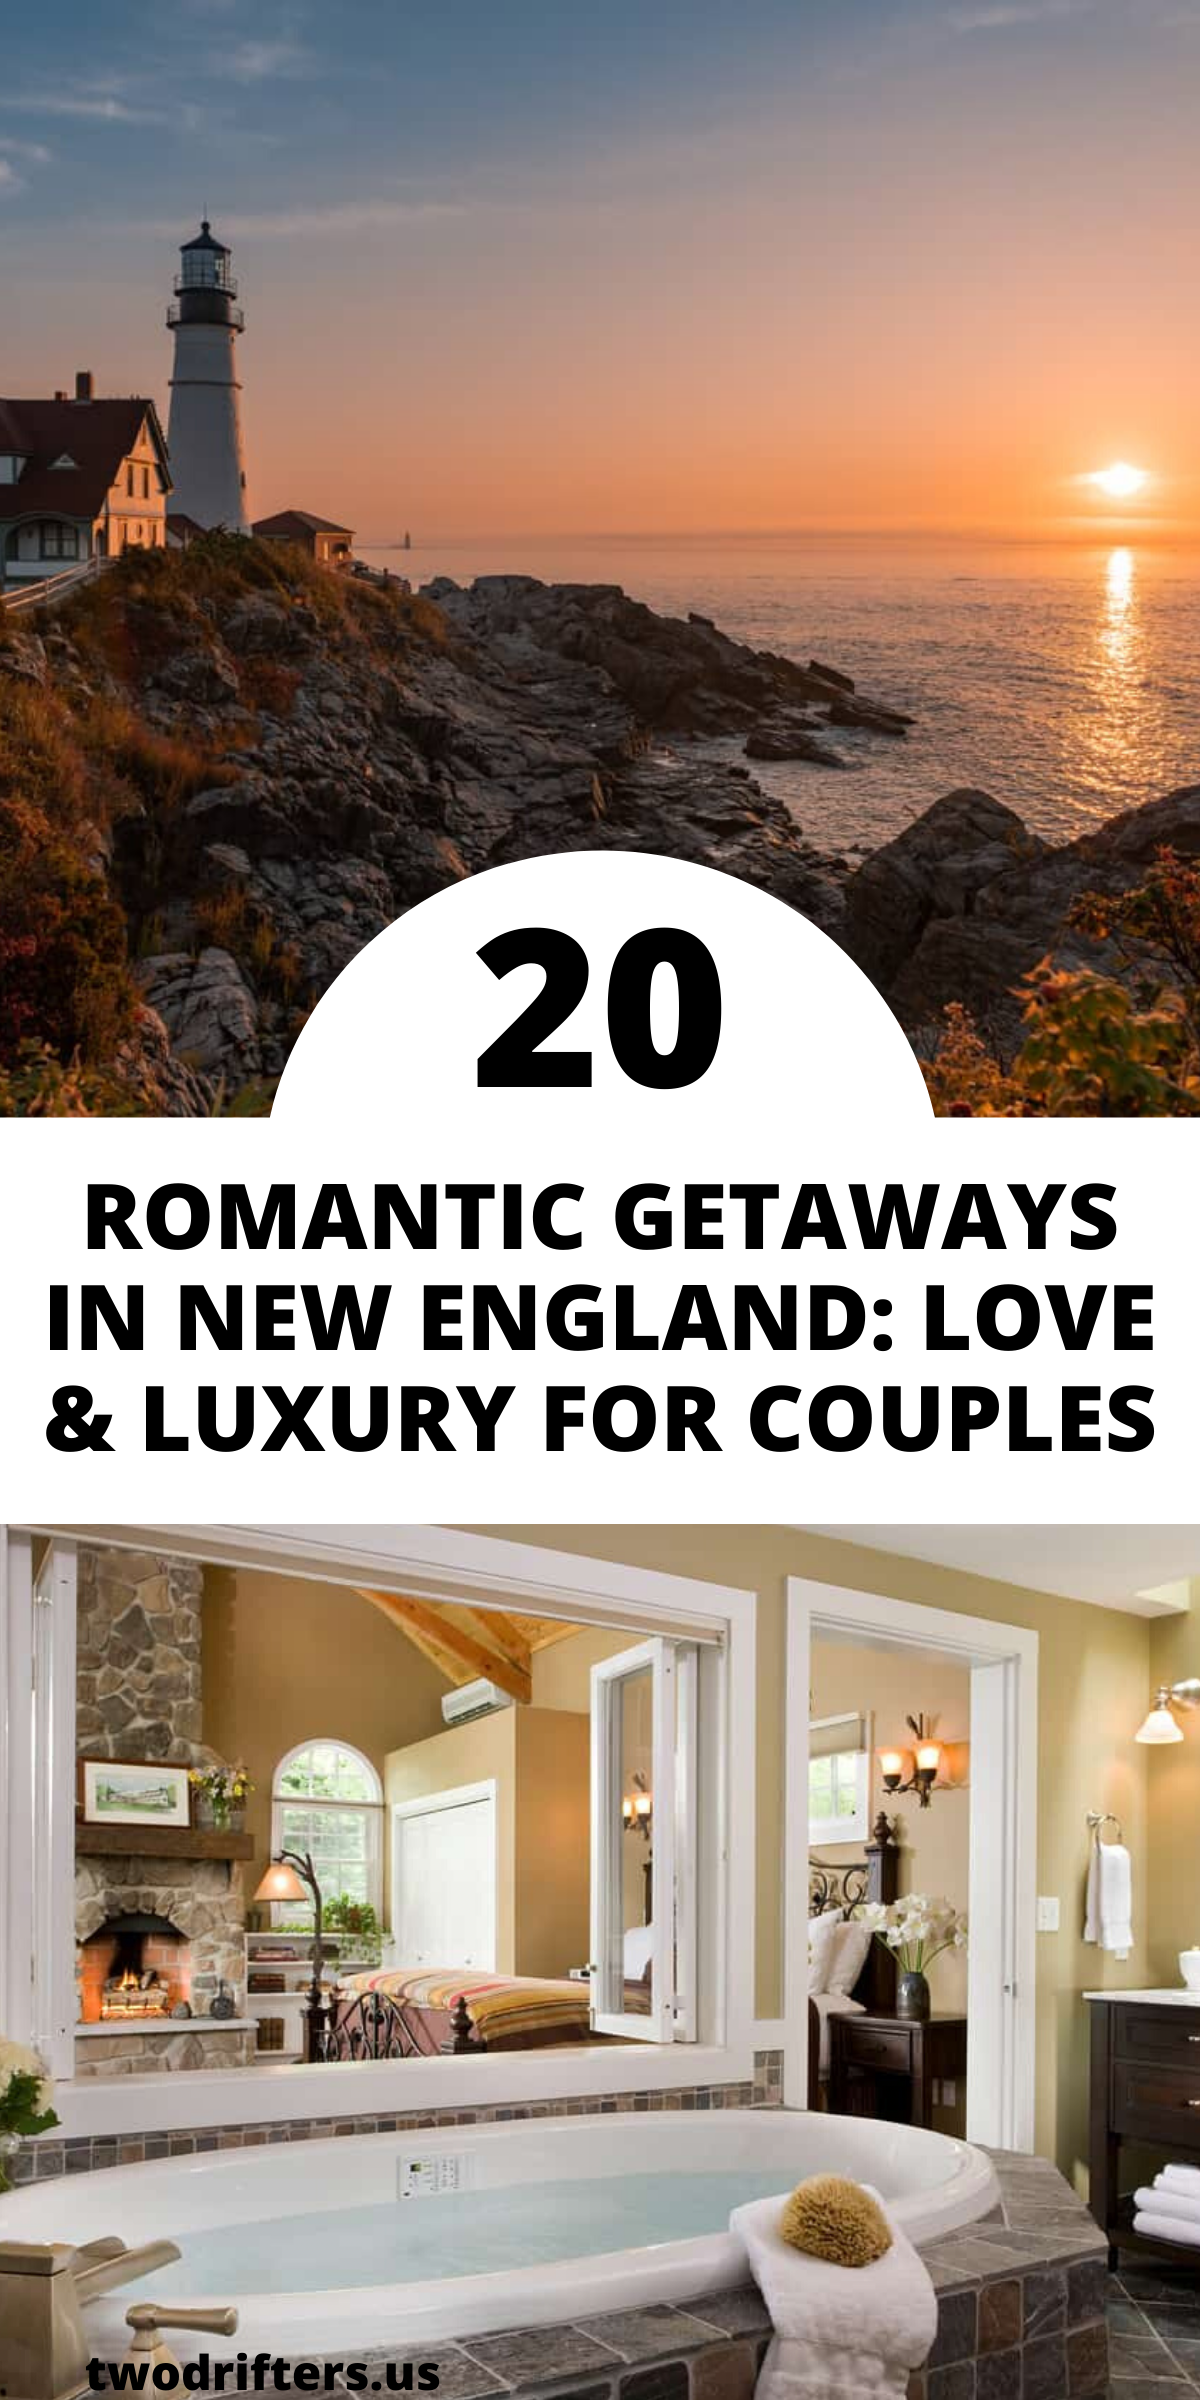 20 Romantic Getaways In New England: Love & Luxury For